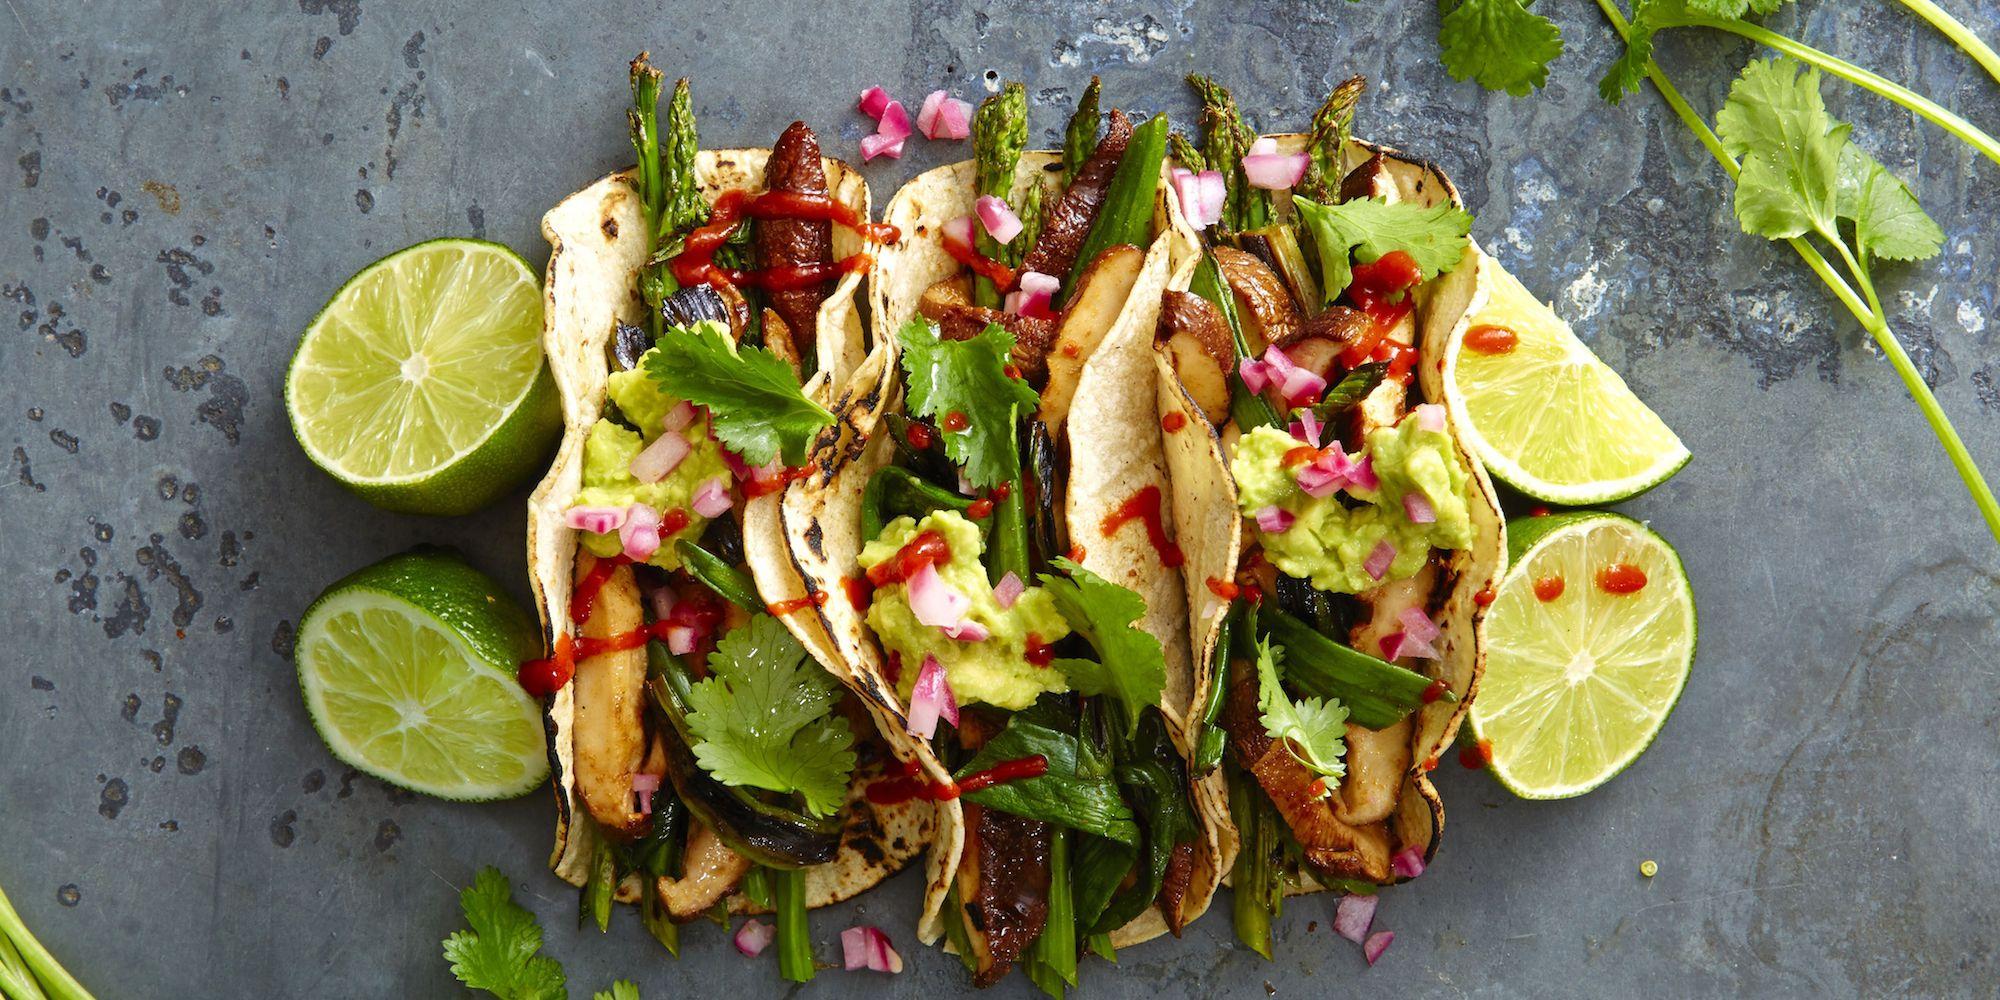 vegan cooking, vegetarian recipes